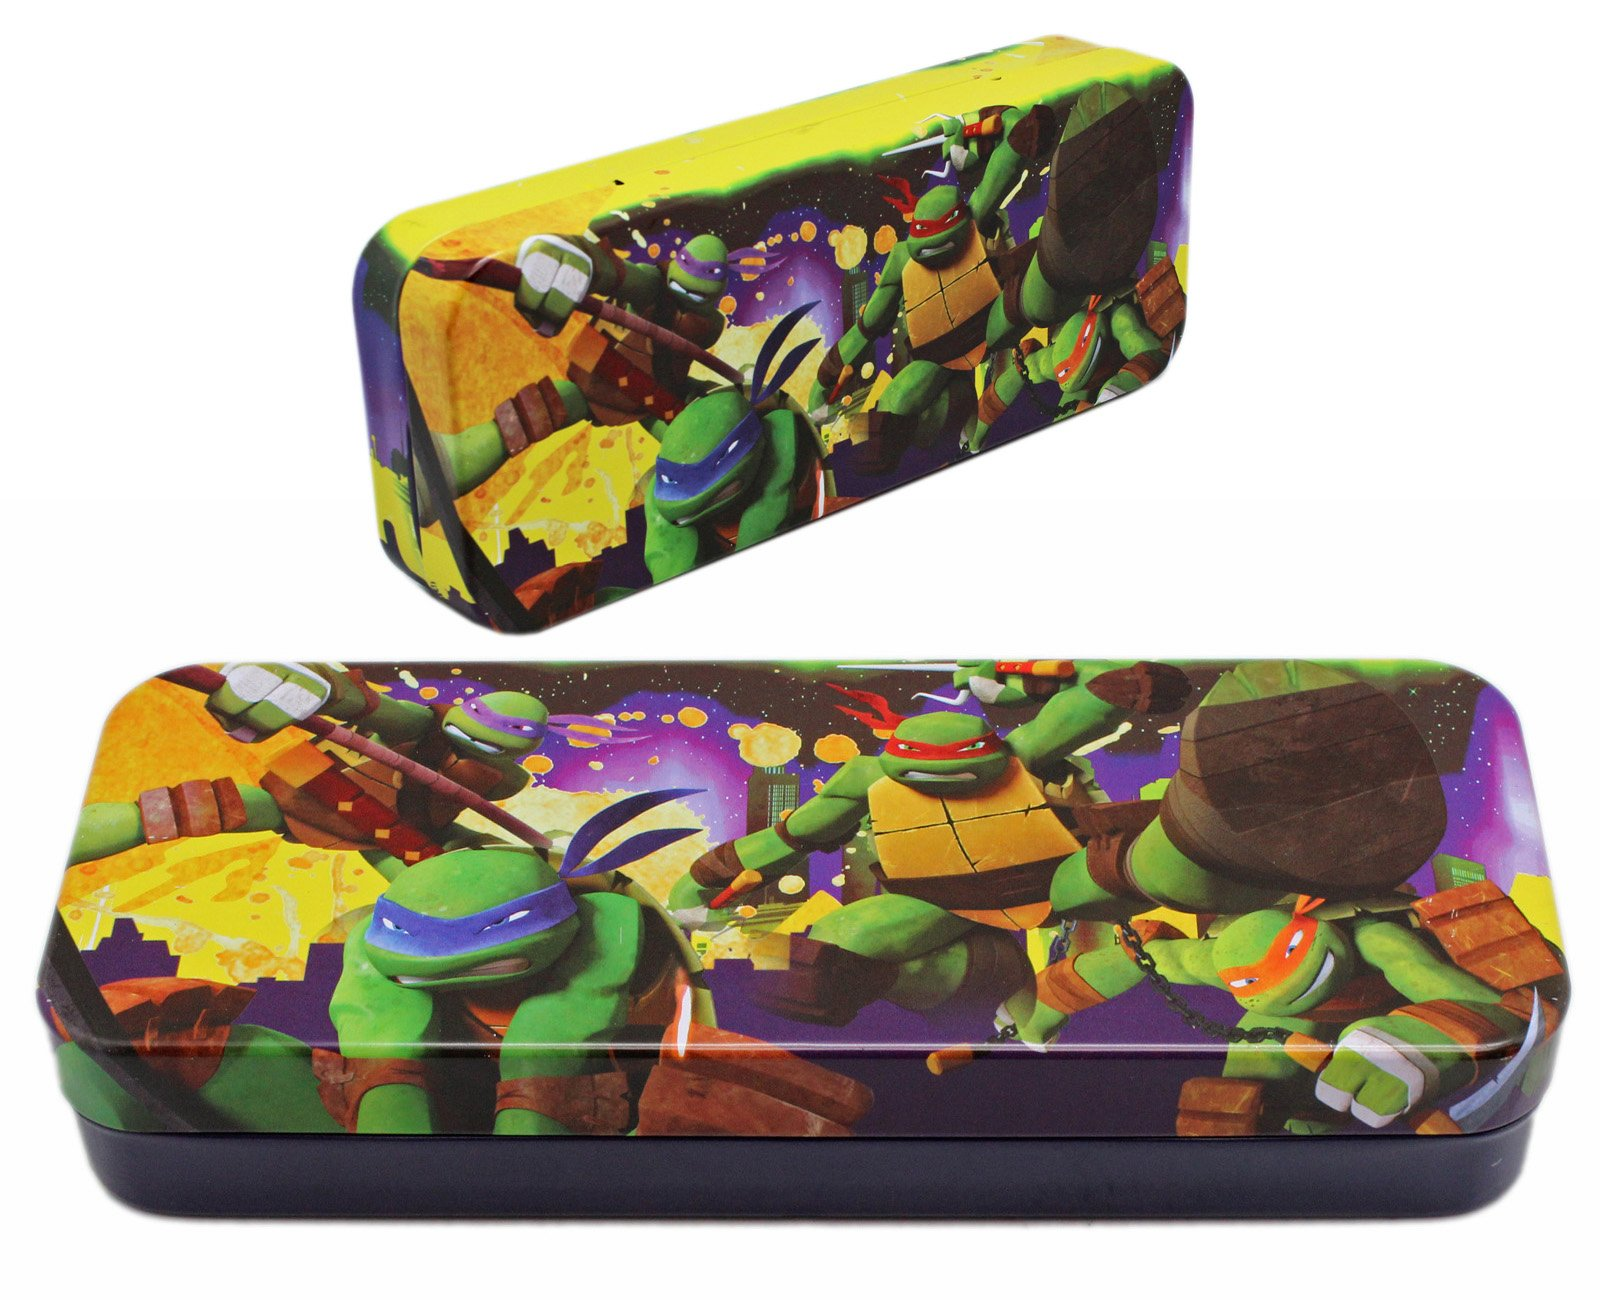 Teenage Mutant Ninja Turtles 3-Ring Zippered Pencil Pouch Case